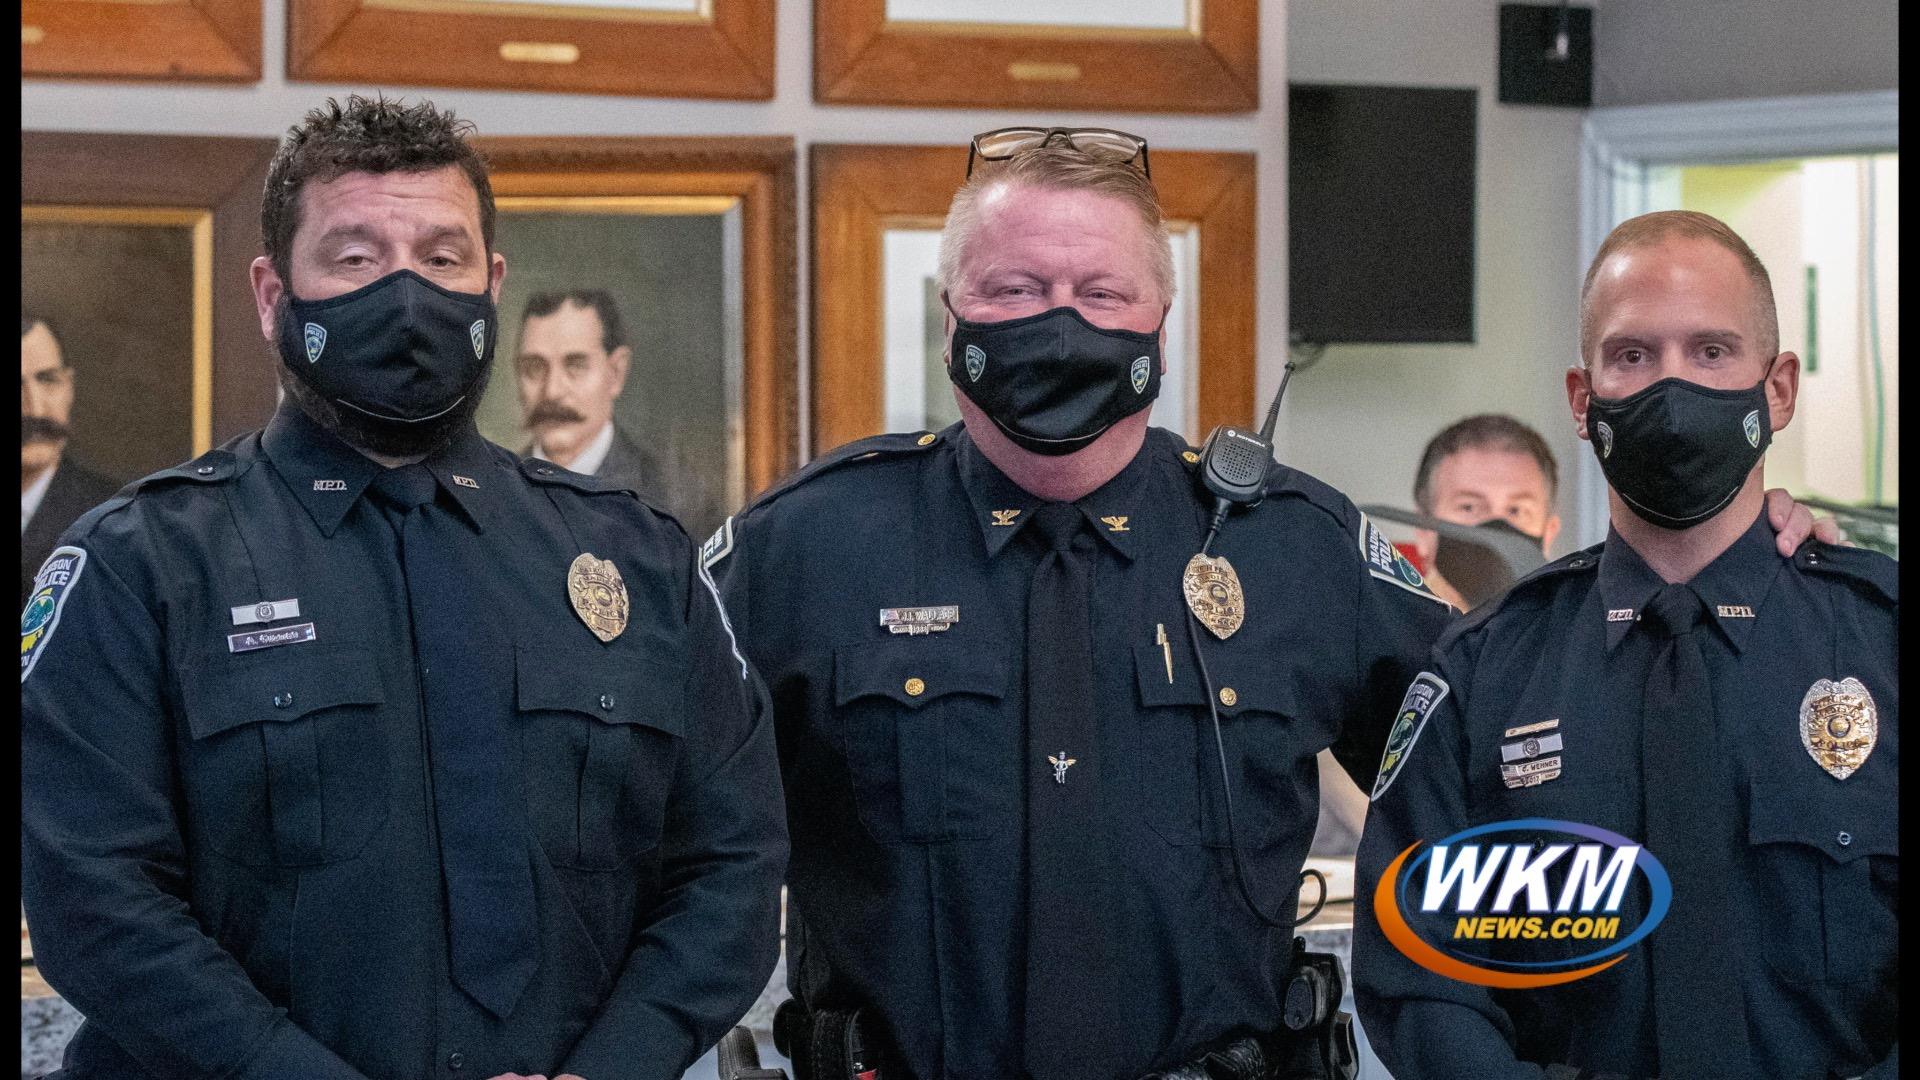 MPD Awards Life-Saving Officers